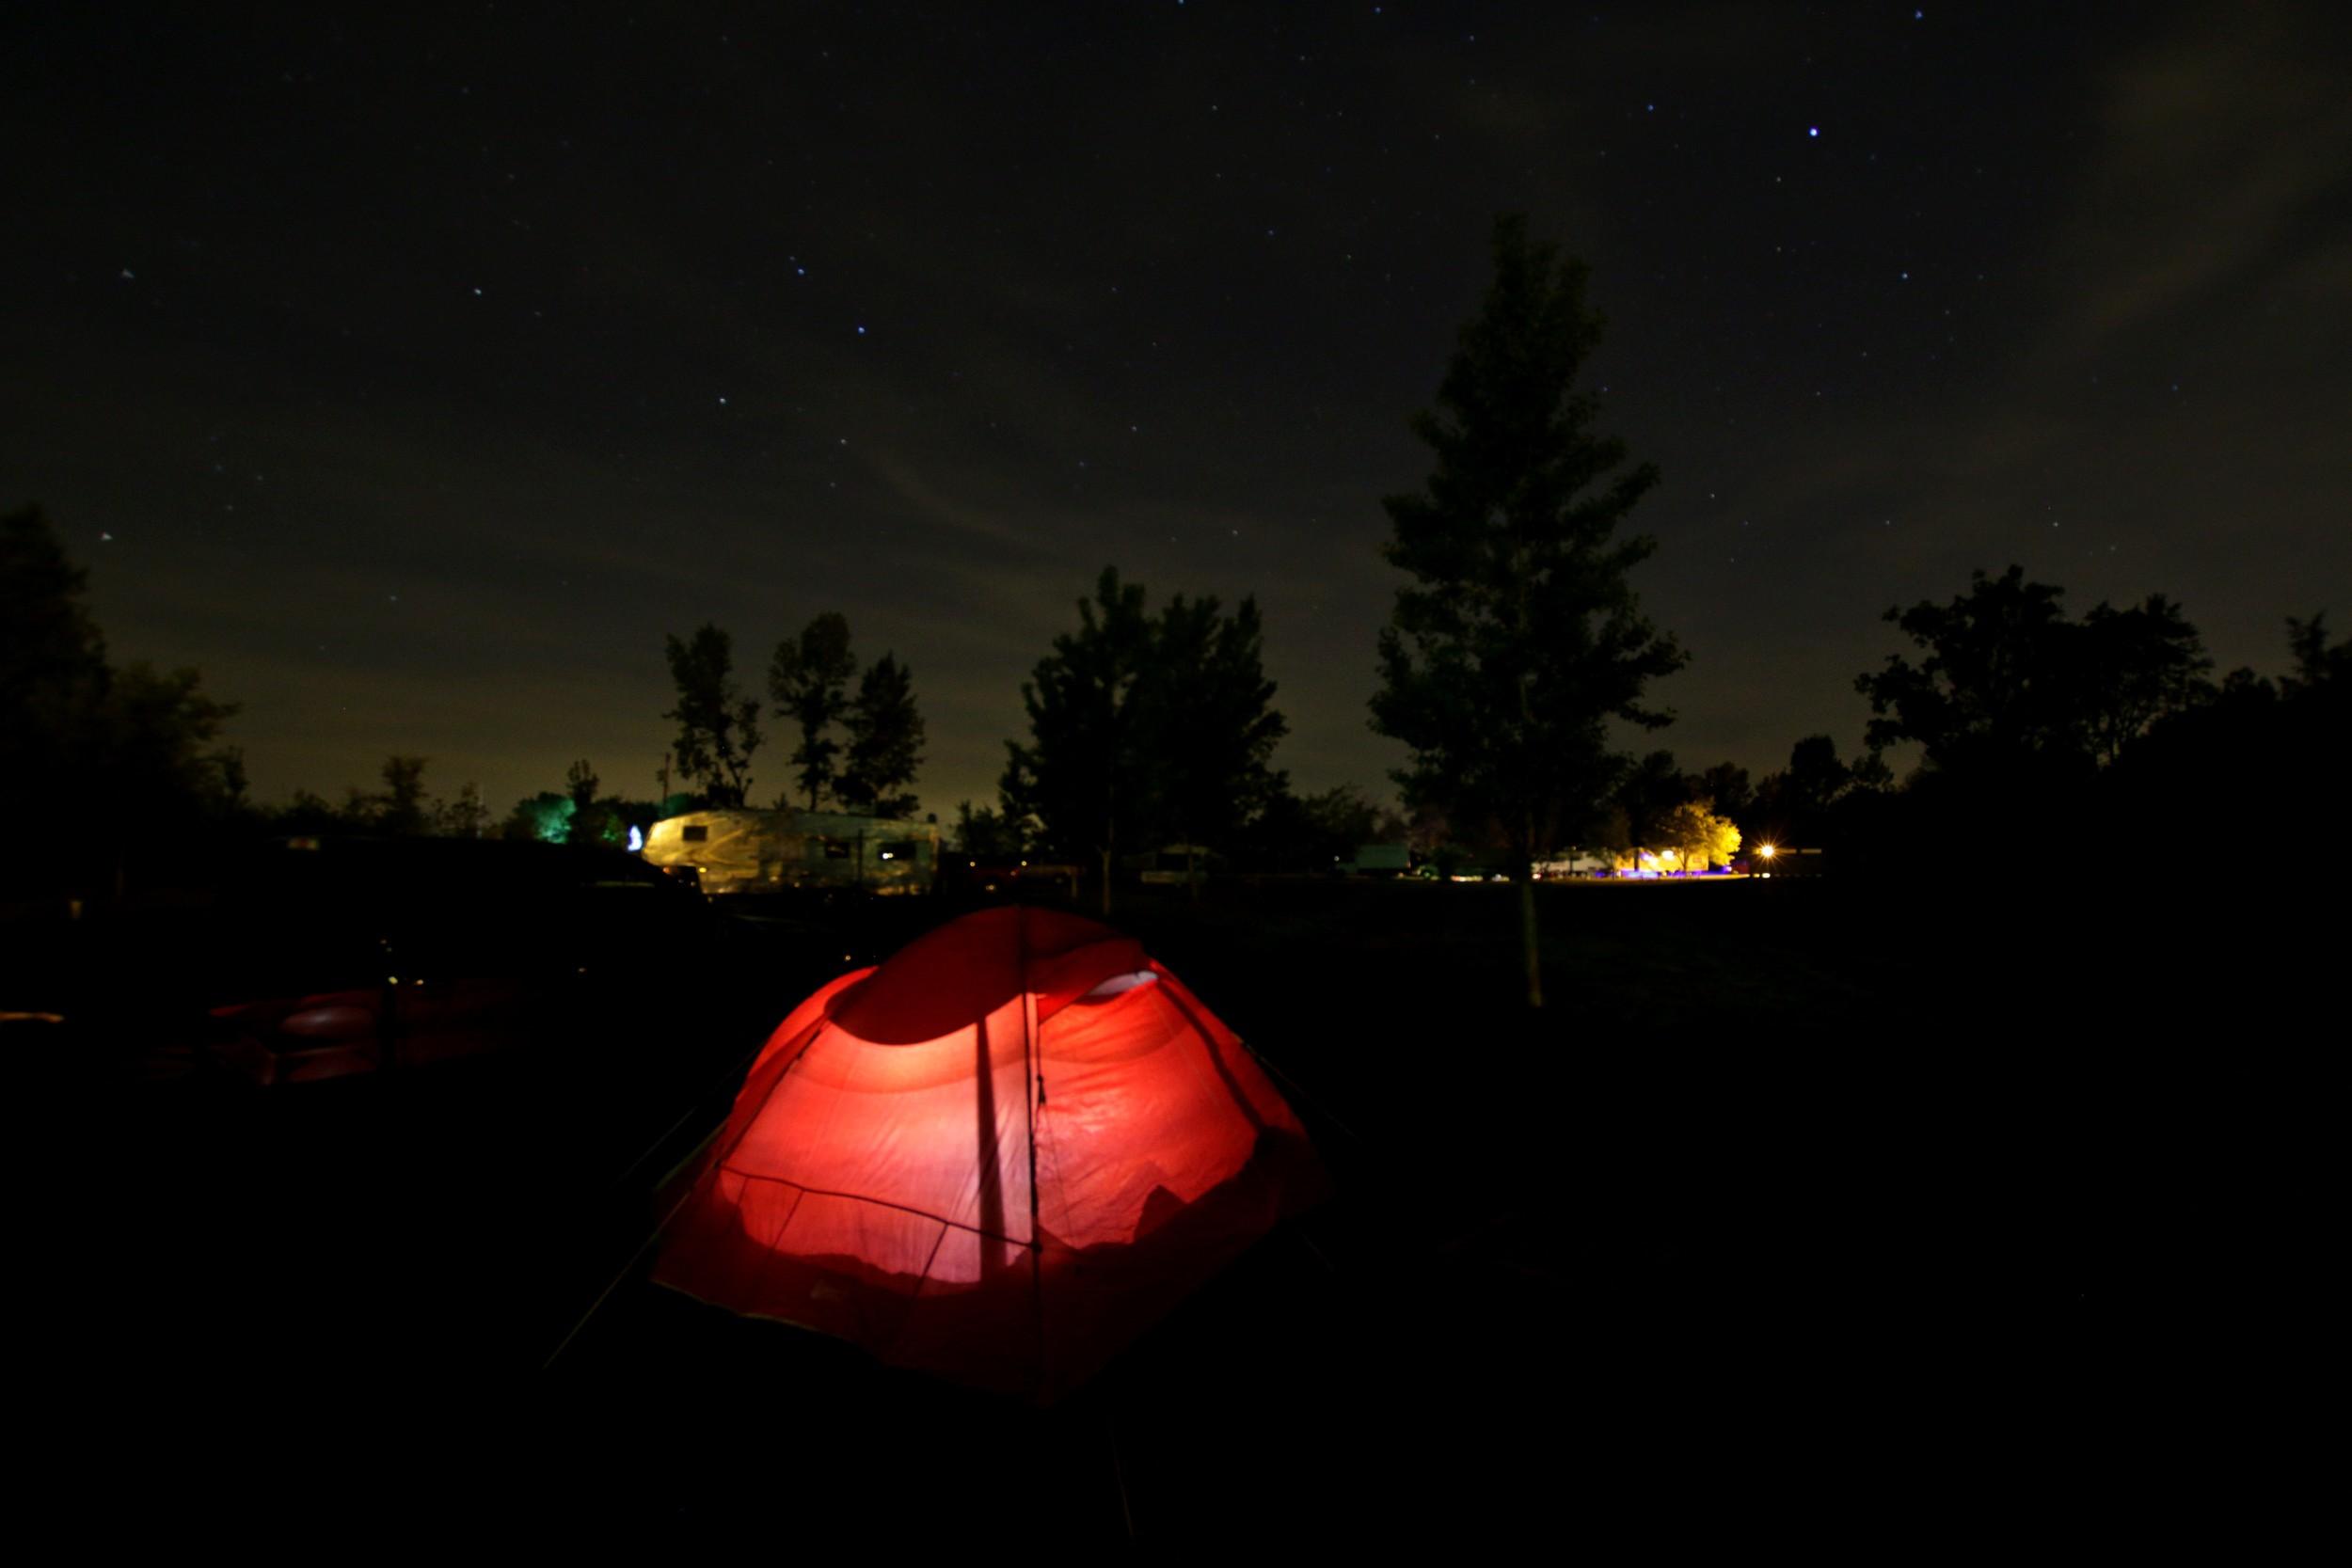 Beautiful night sky and awesome tent from Grandma and Grandpa Micik